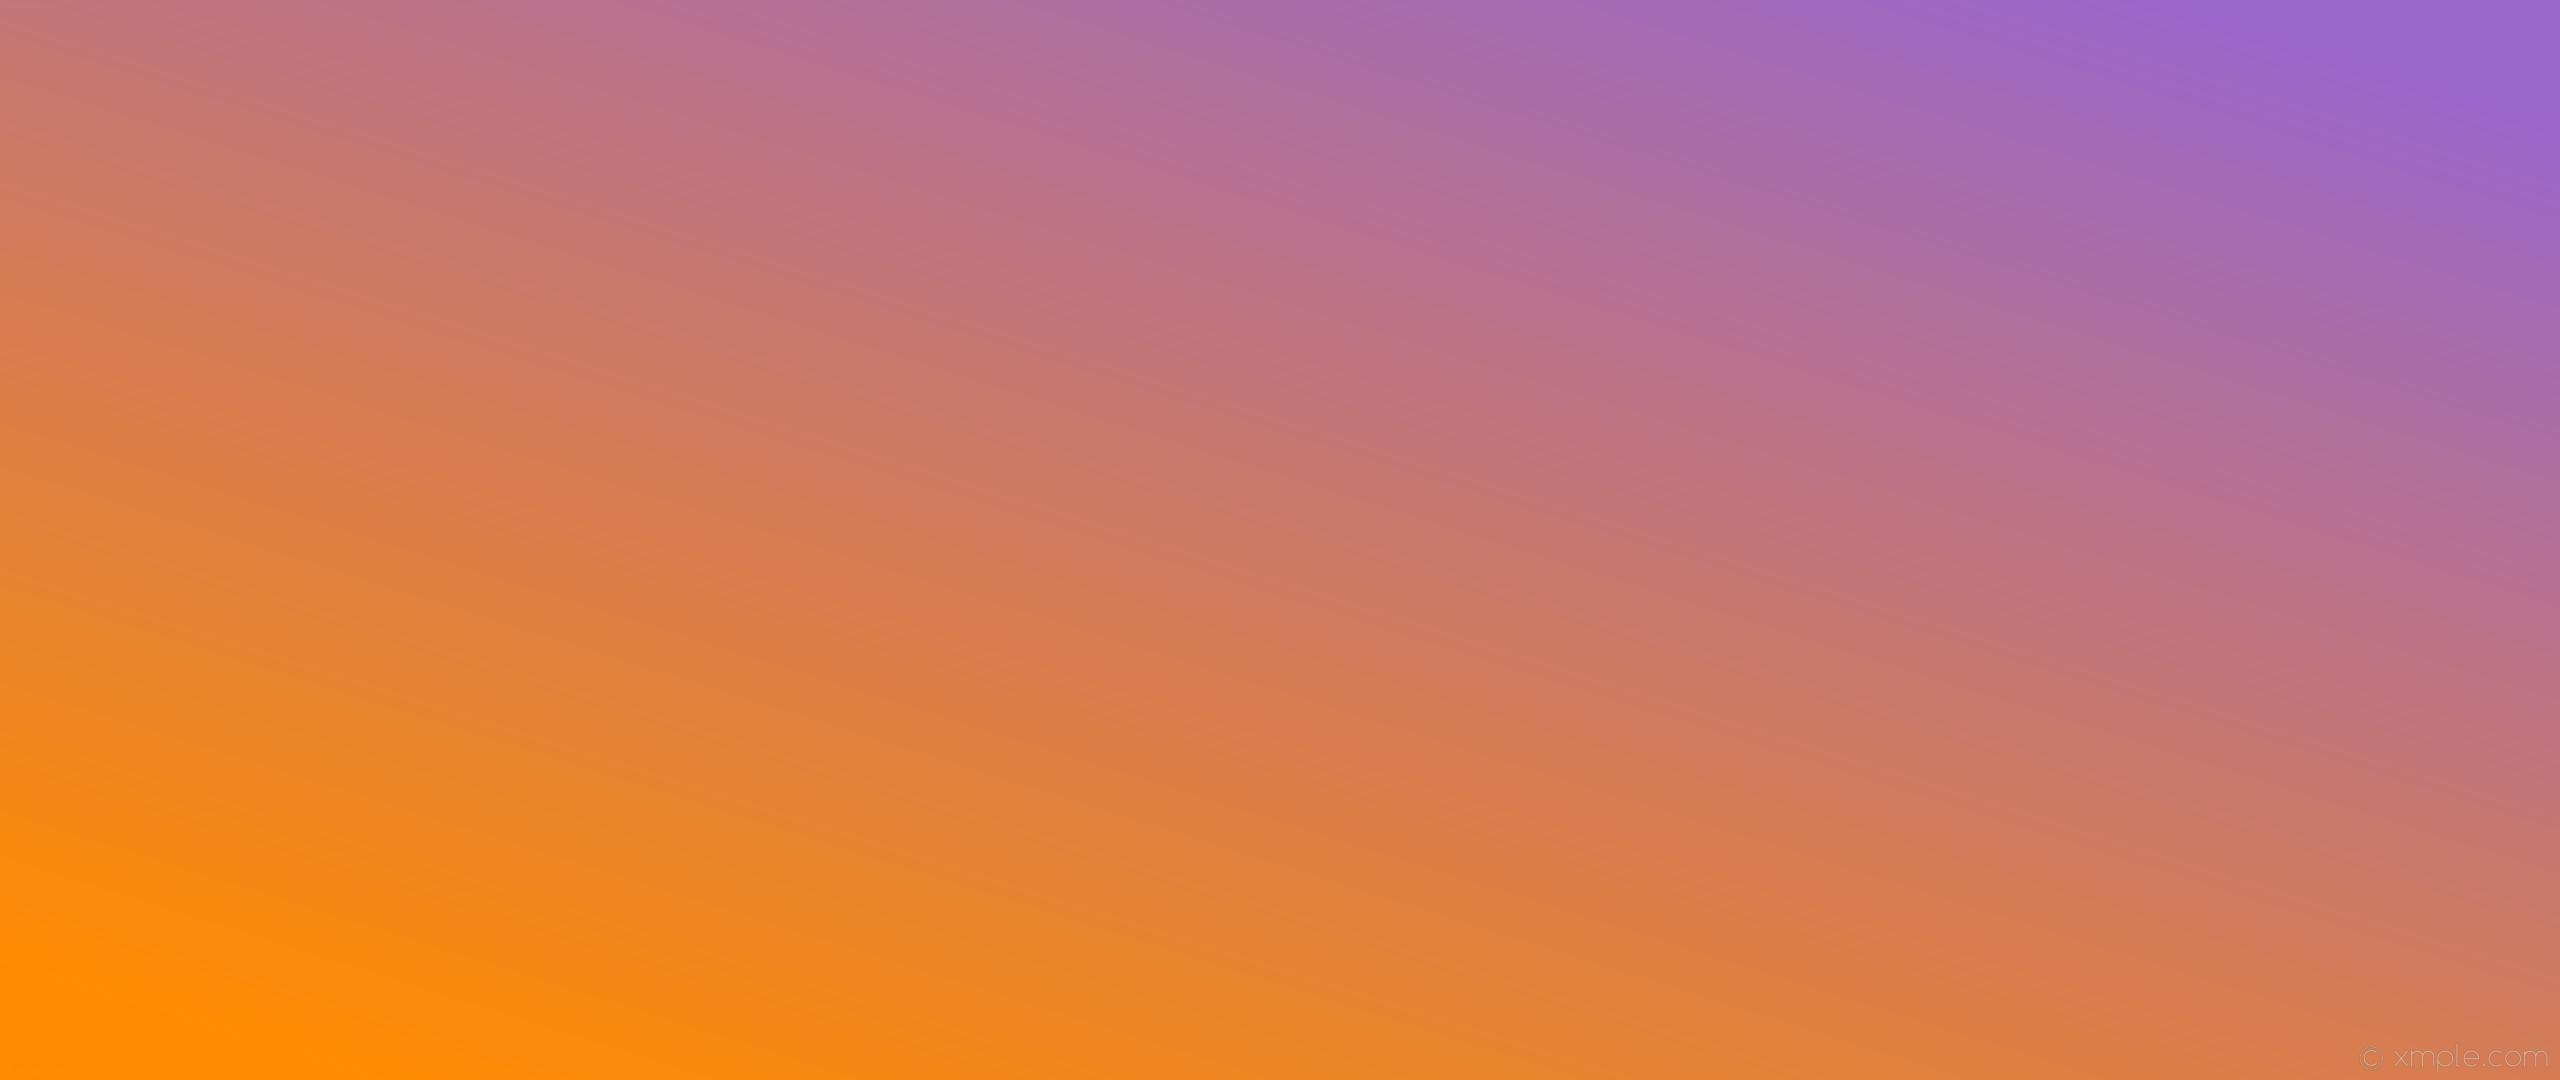 wallpaper orange gradient linear purple dark orange amethyst #ff8c00  #9966cc 210°